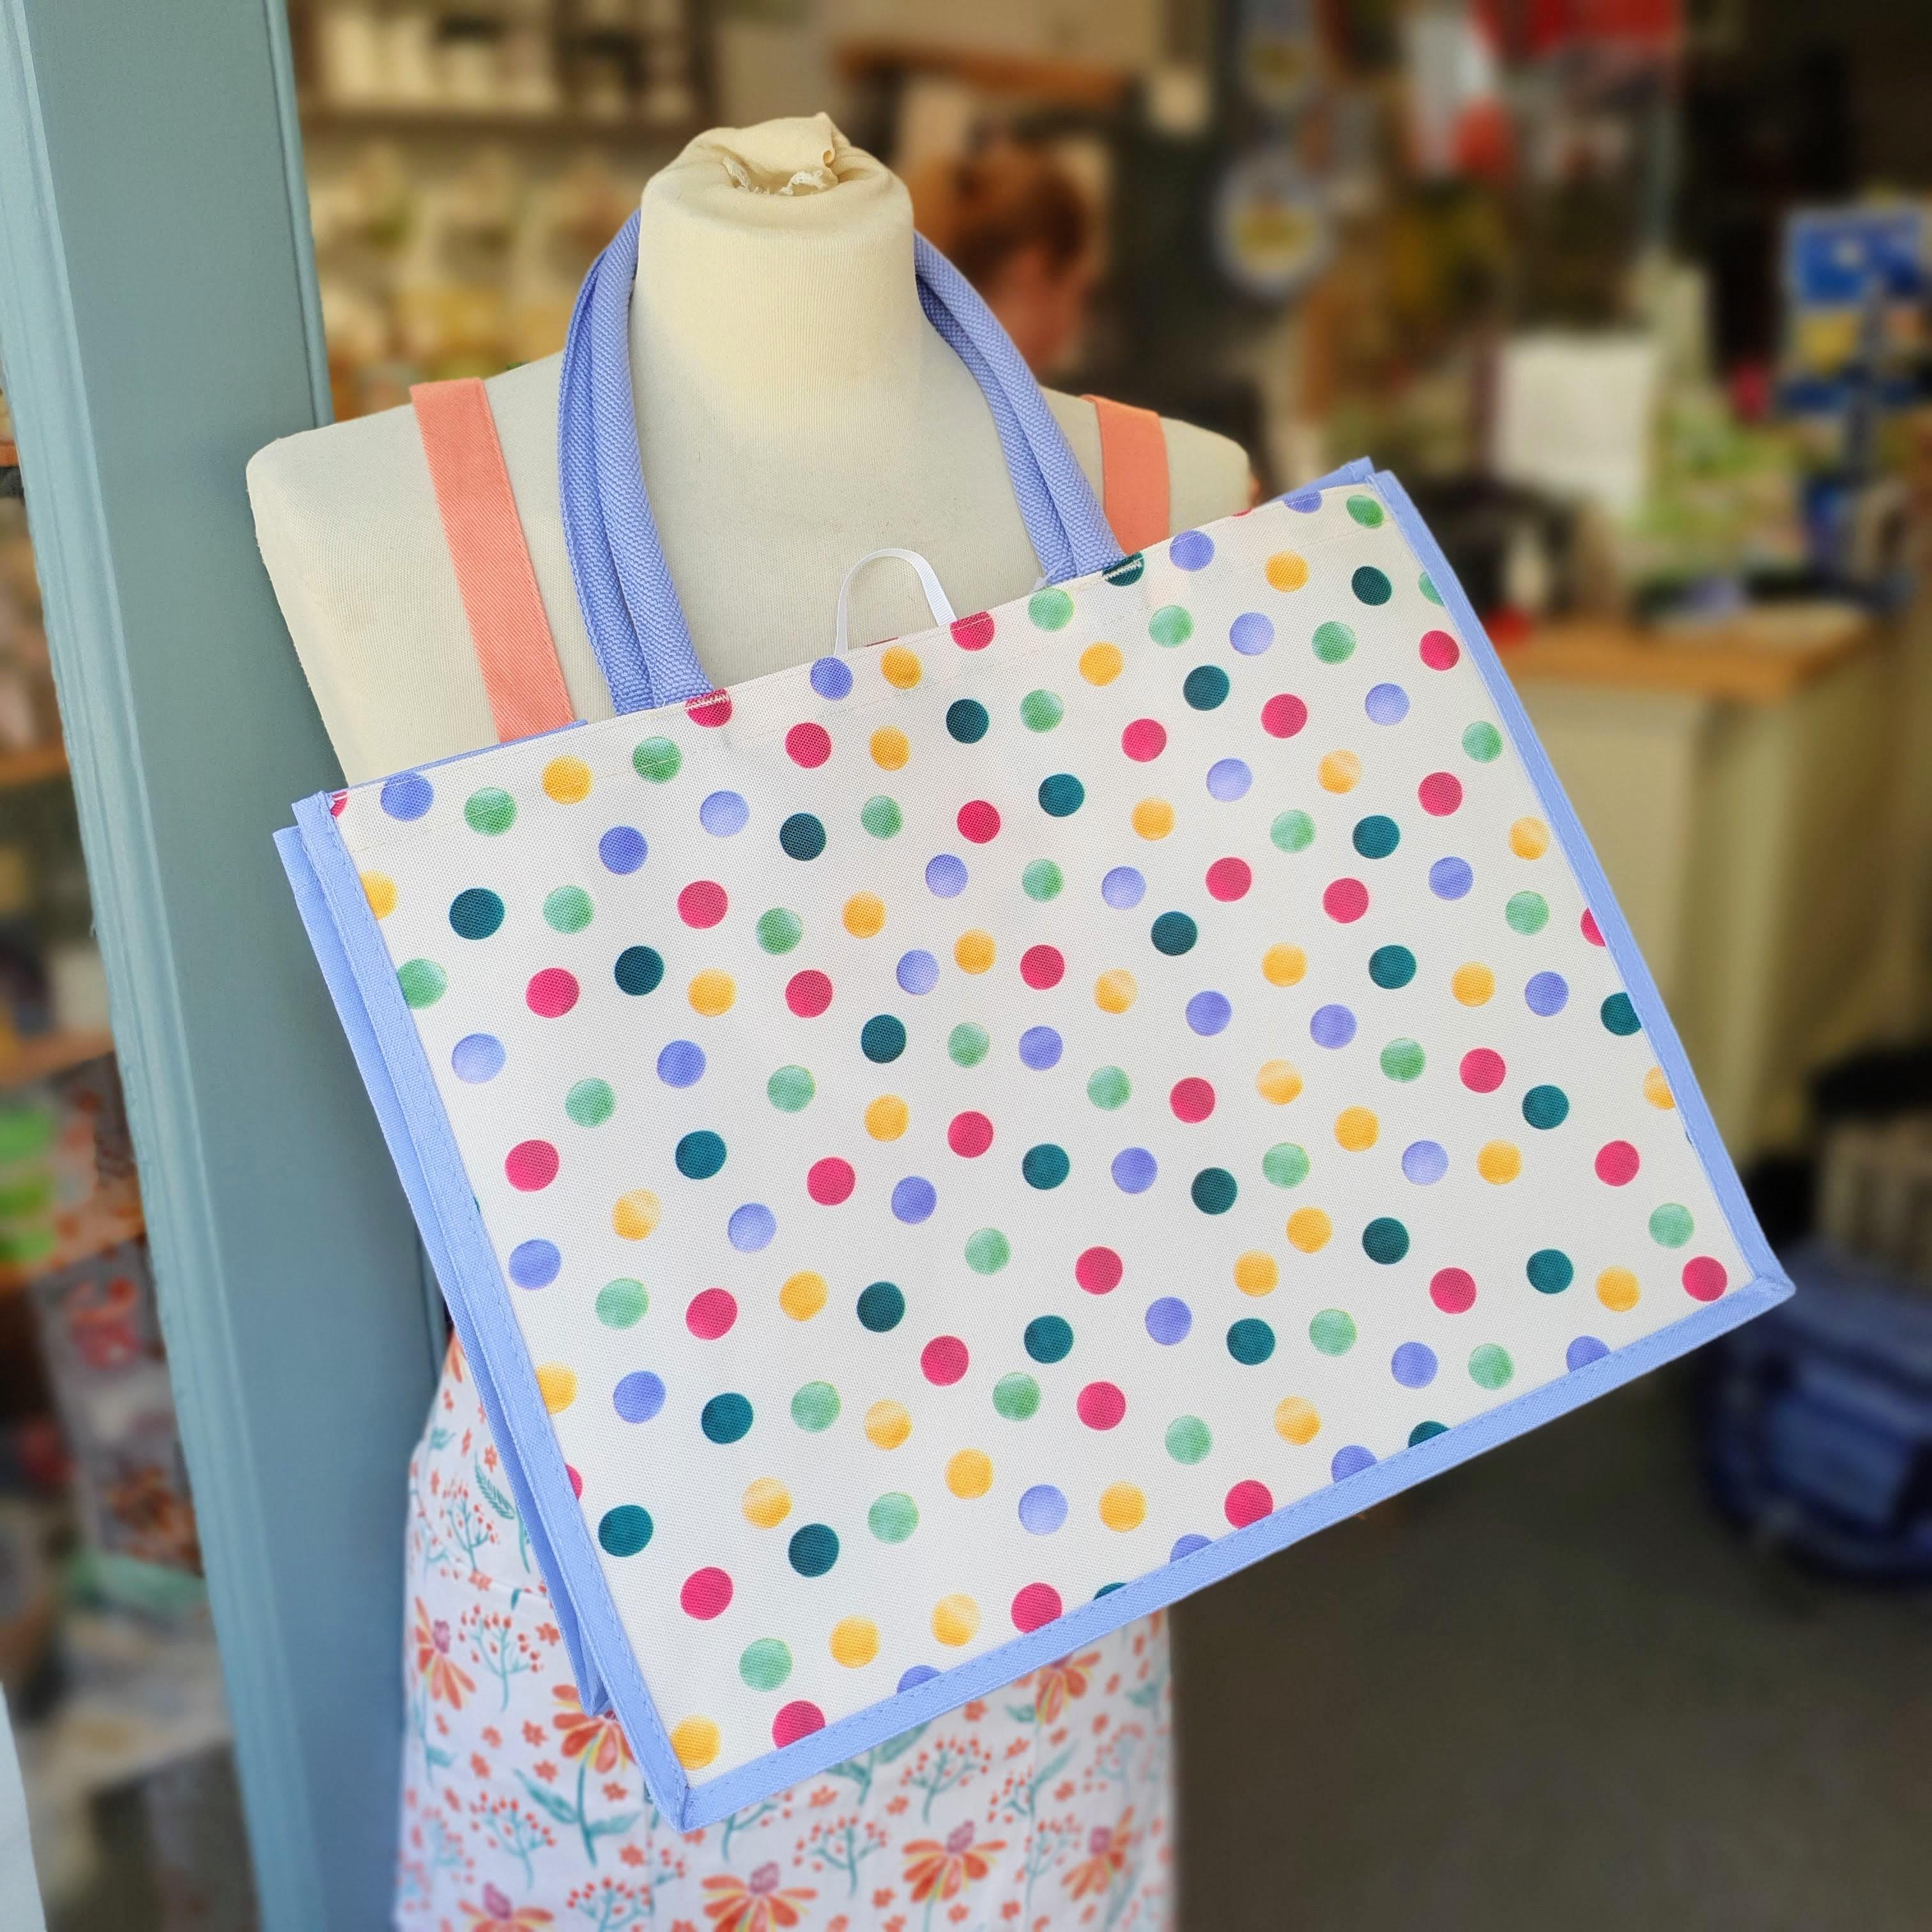 Emma Bridgewater Shopping Bag - Polka Dot